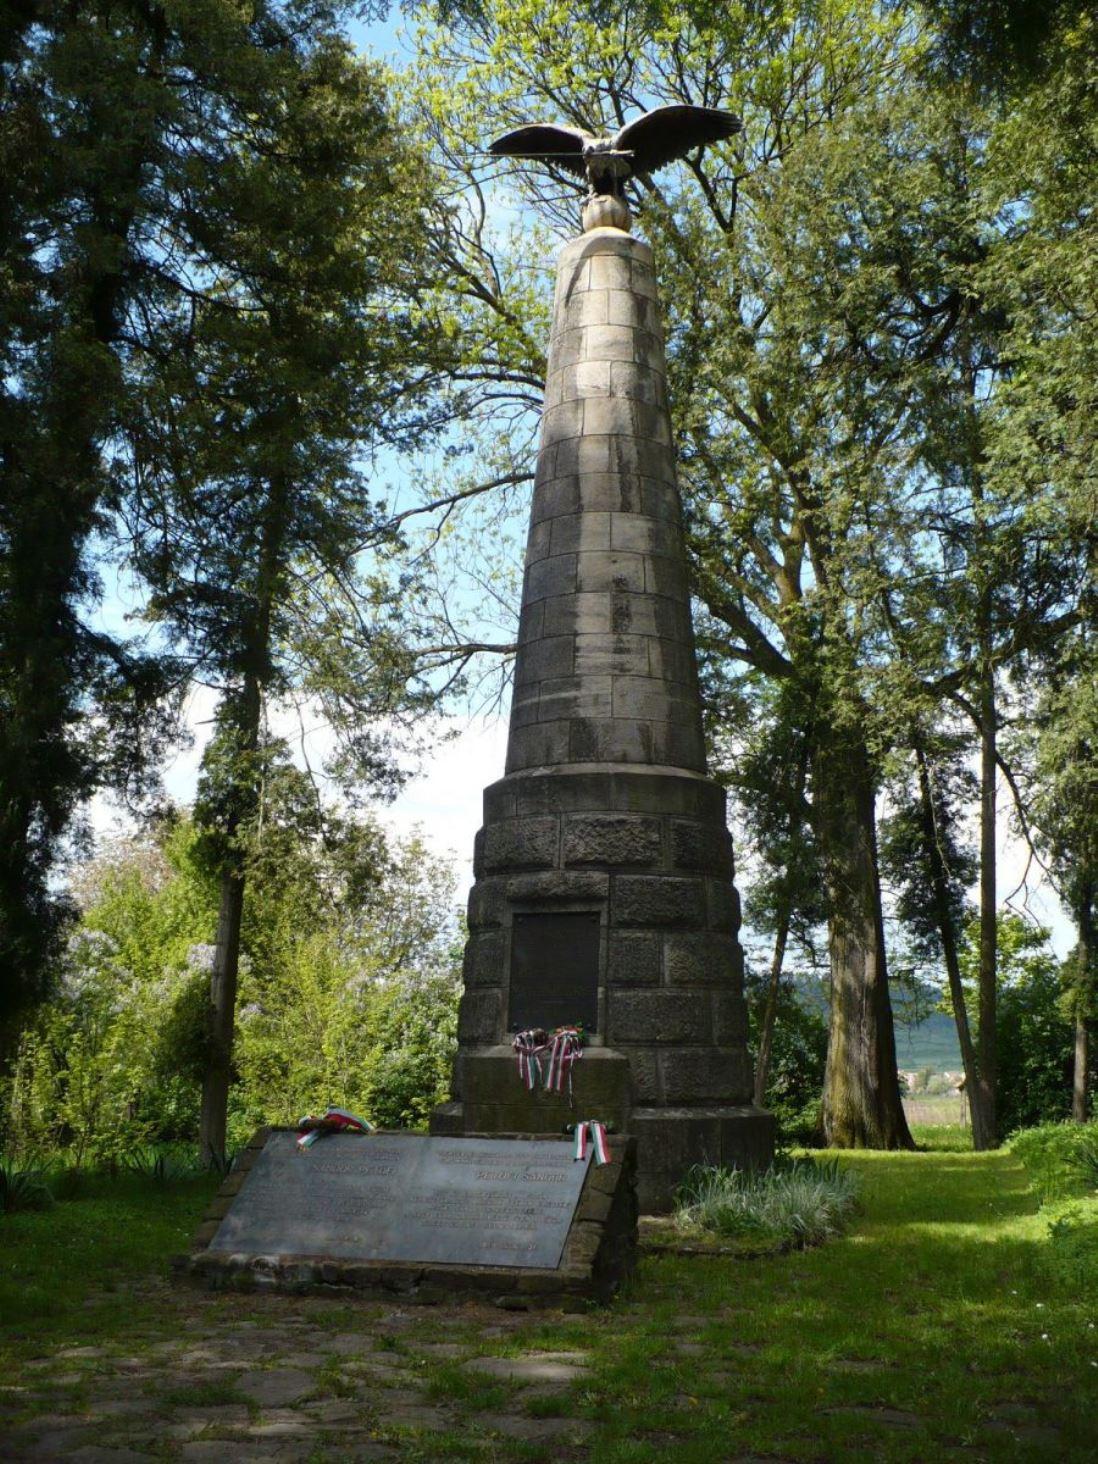 1848 Revolution monument